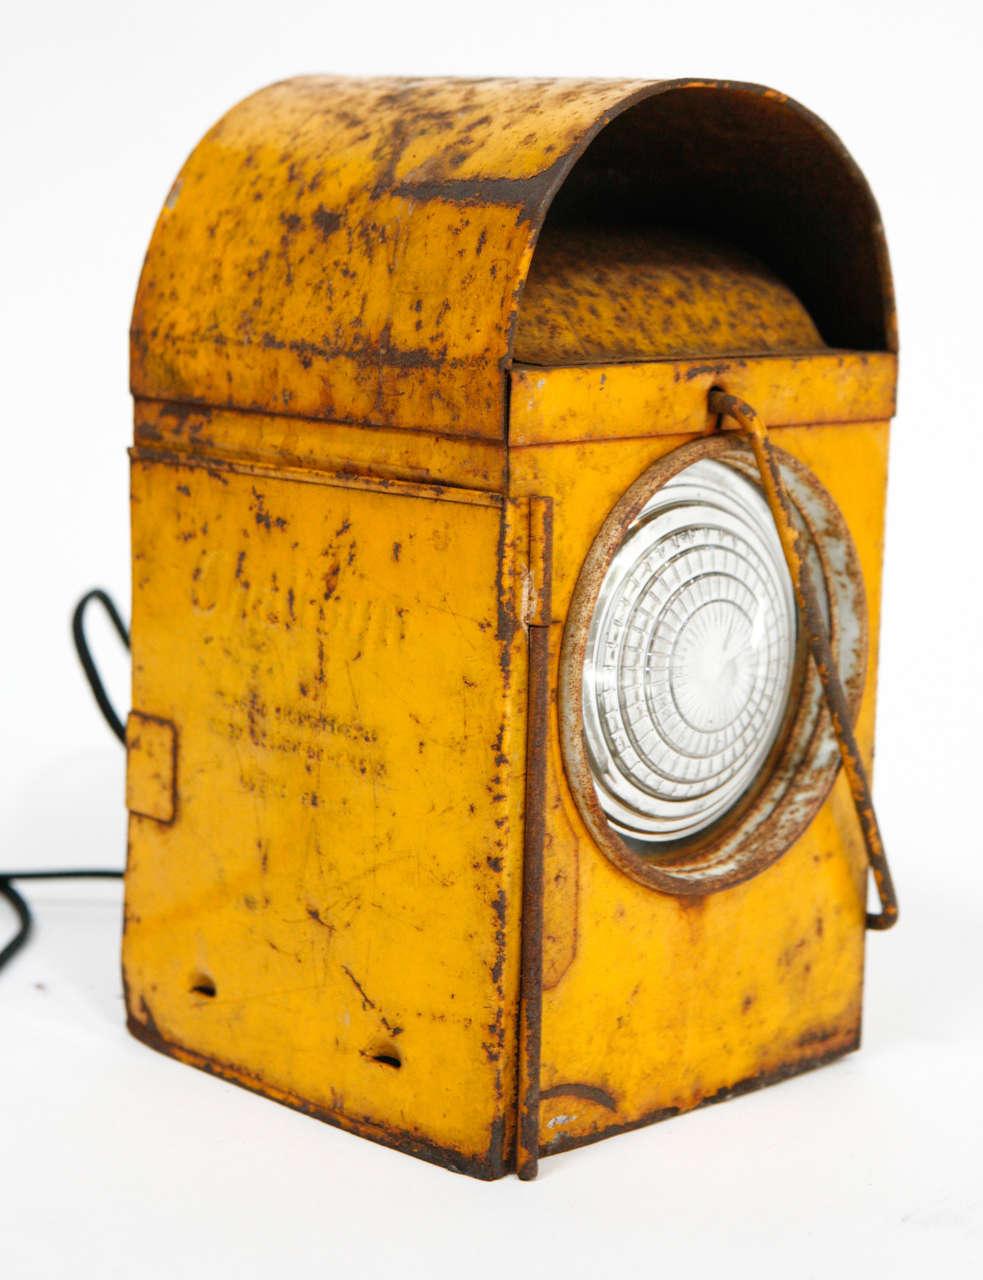 Vintage road work lanterns